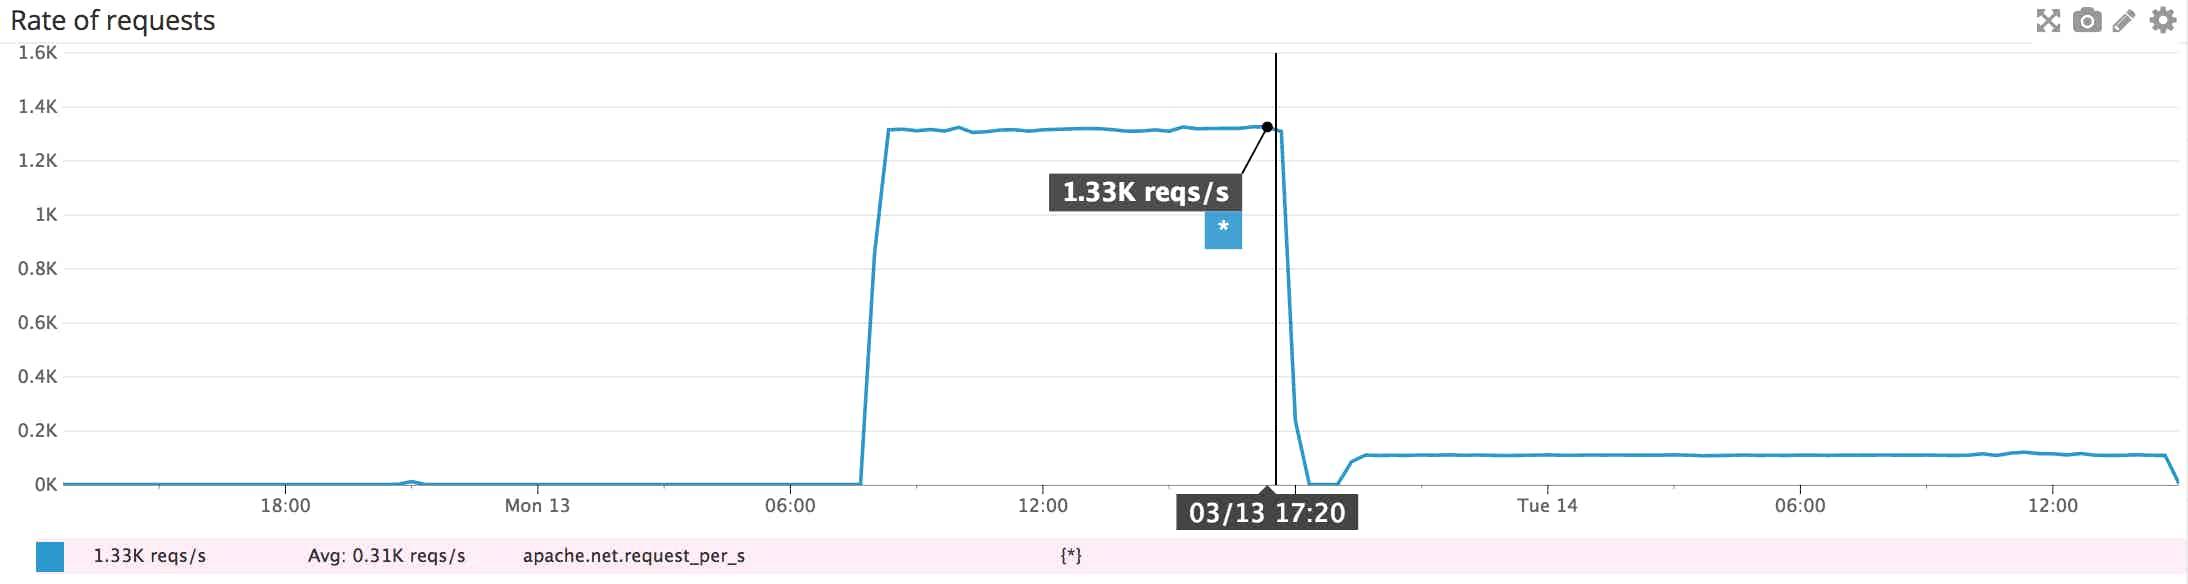 Apache monitoring - requests per second graph